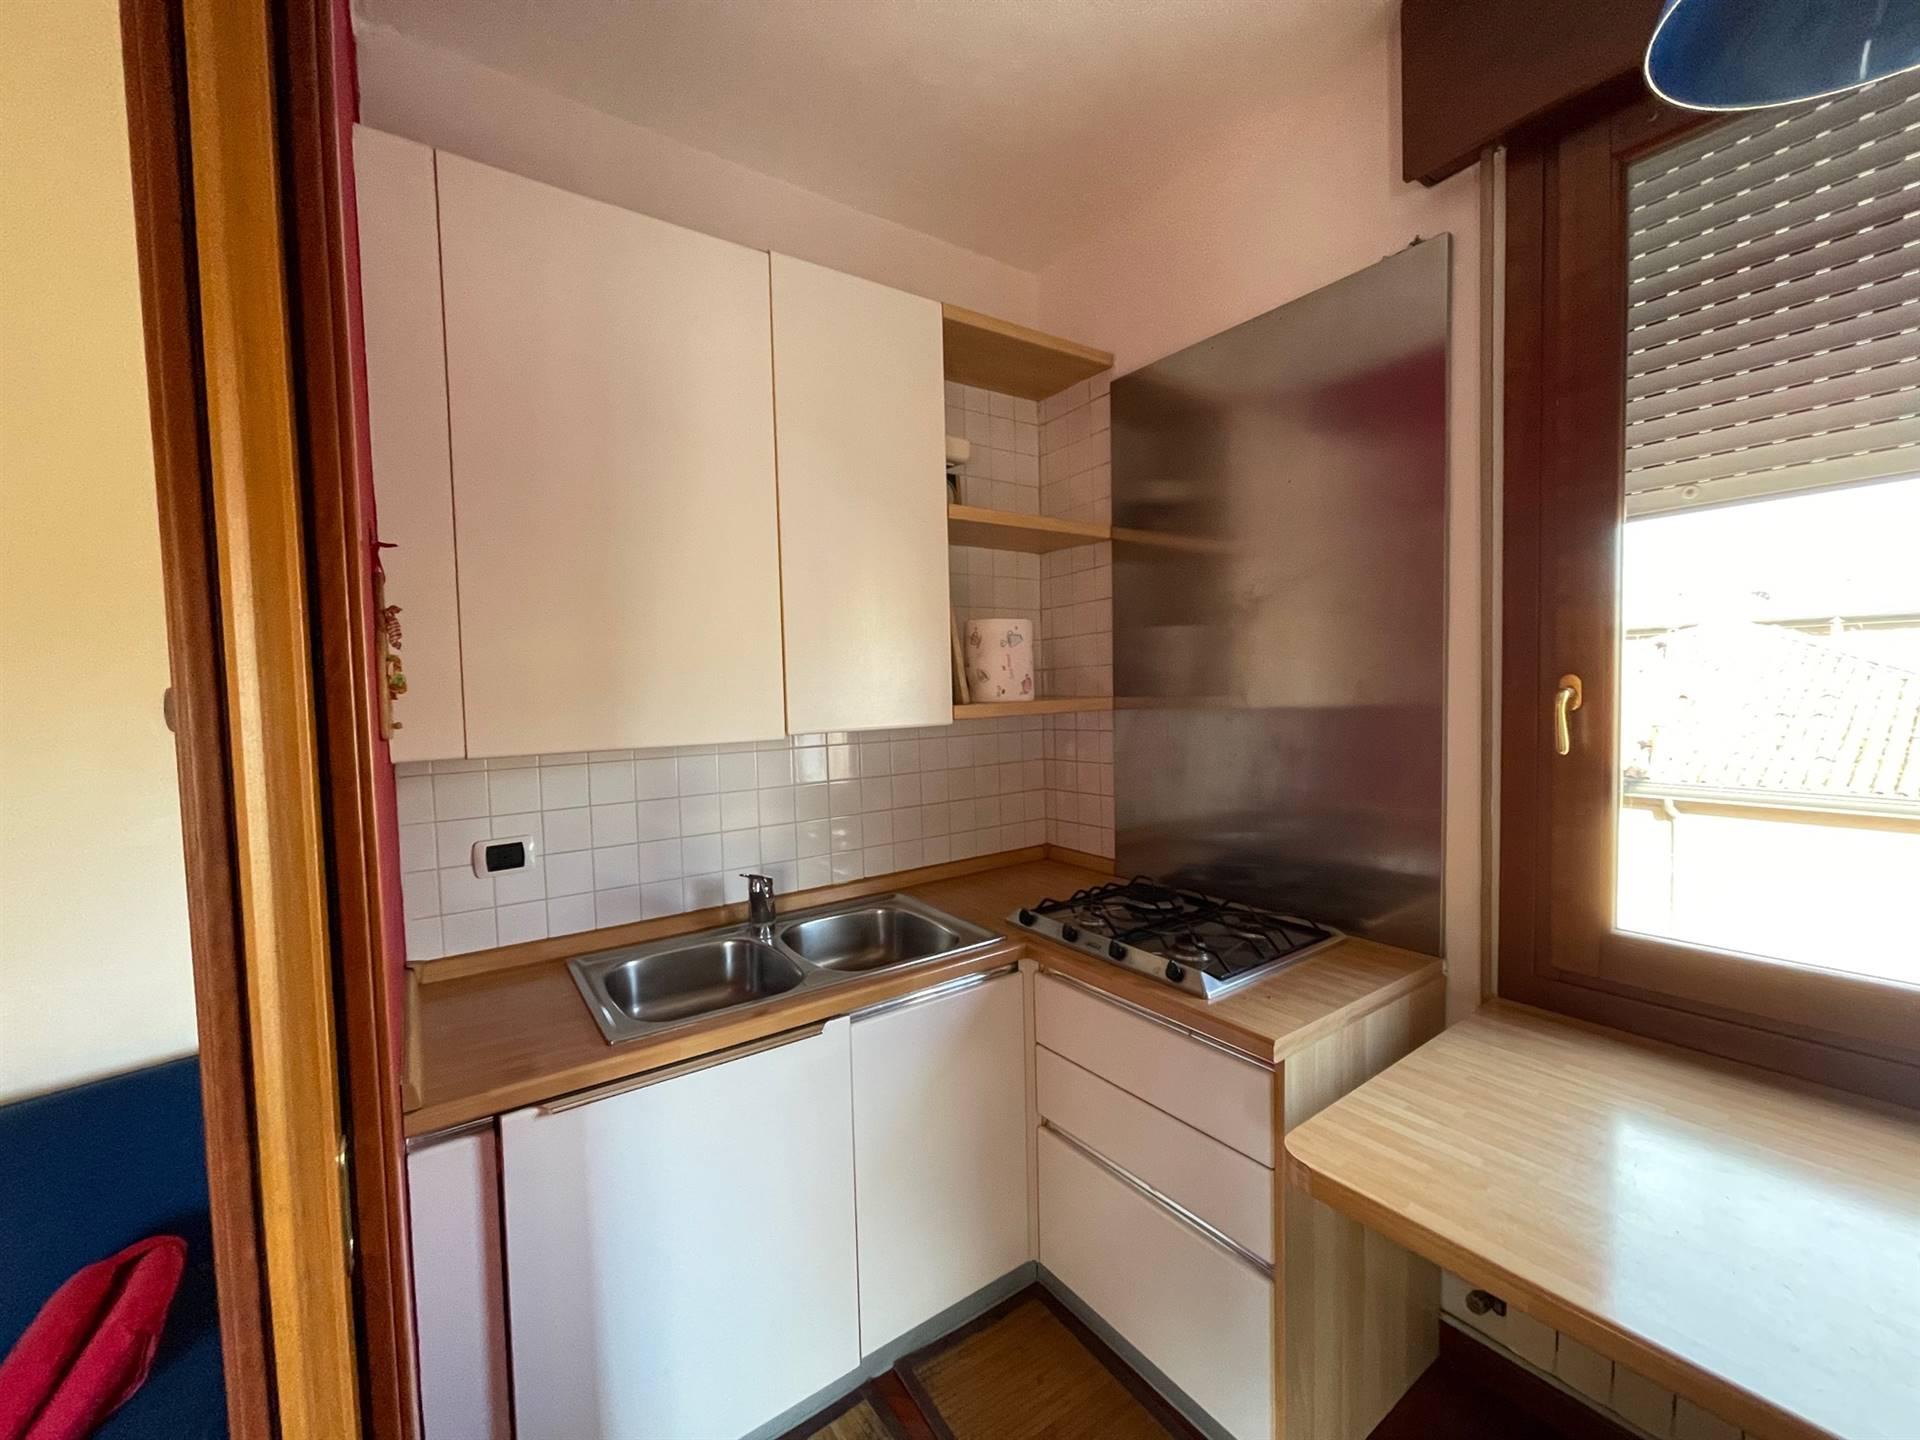 cucinotto appartamento vendita Mestre euro 128.000